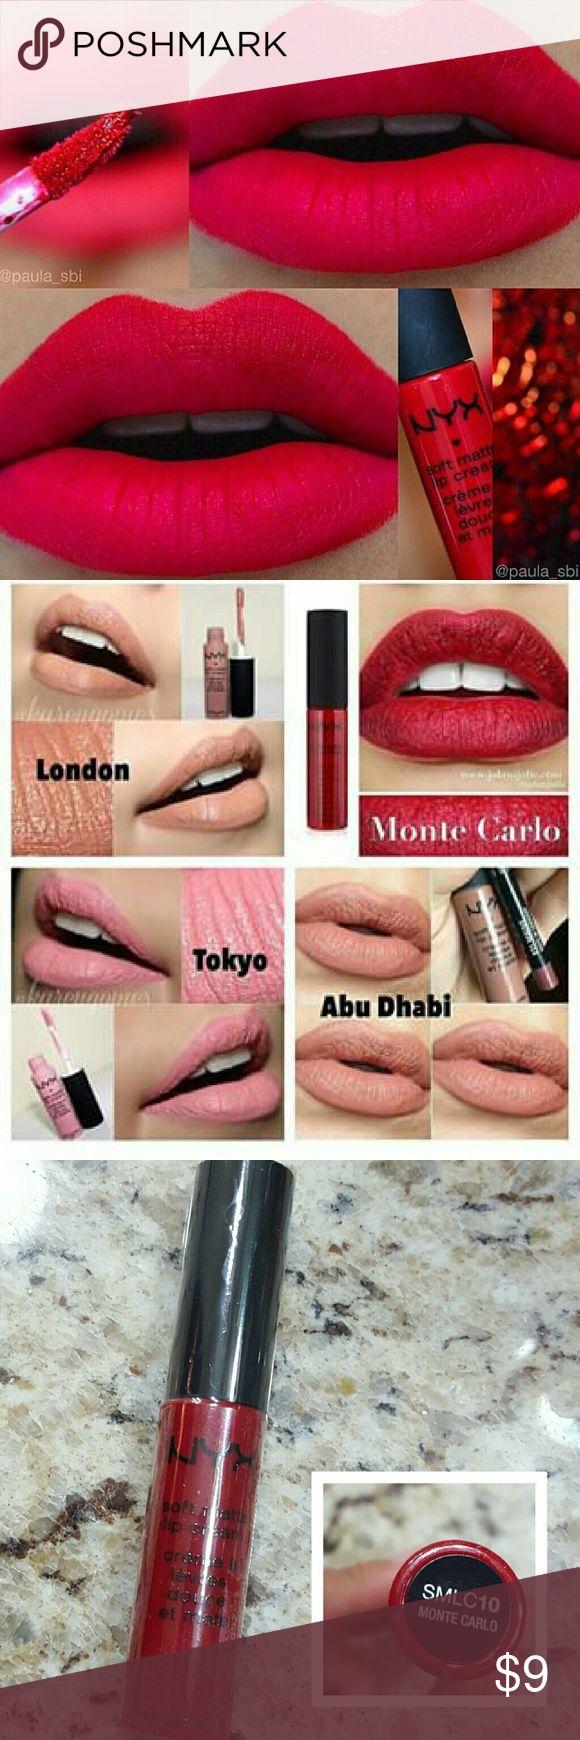 102 Best Makeup Images On Pinterest Beauty Gorgeous Nyx Soft Matte Lip Cream All Variant Monte Carlo Boutique